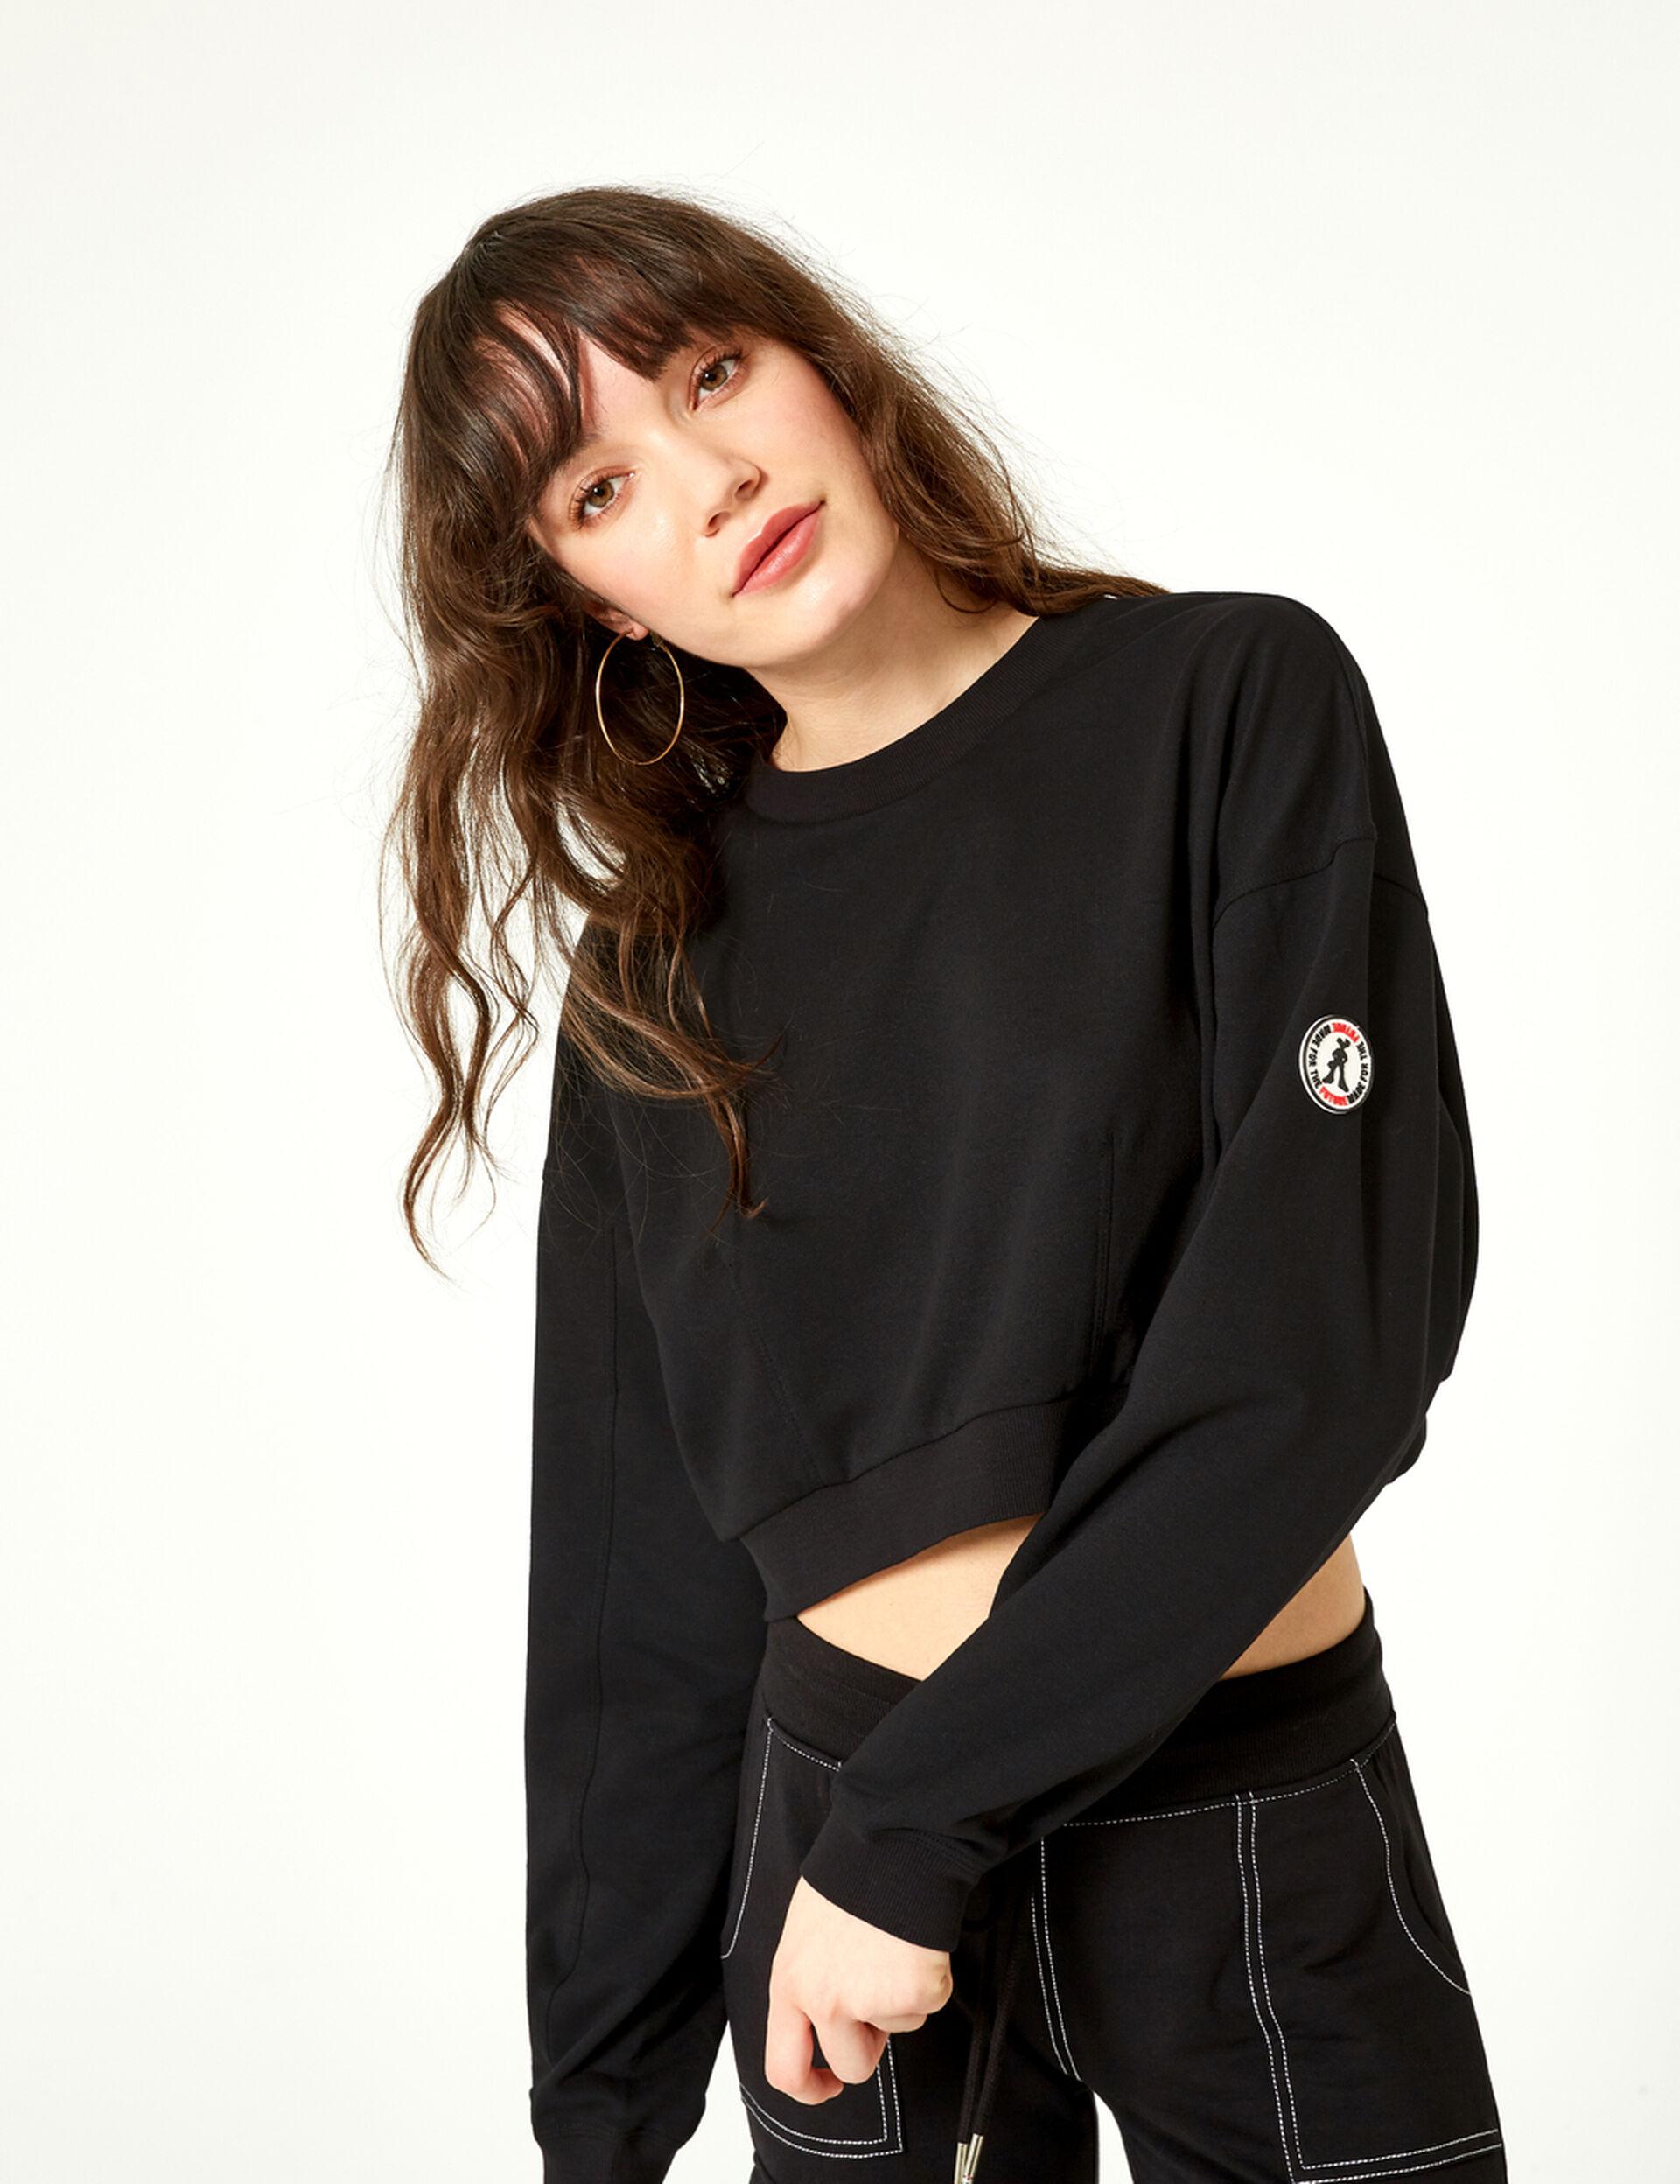 Cropped black sweatshirt